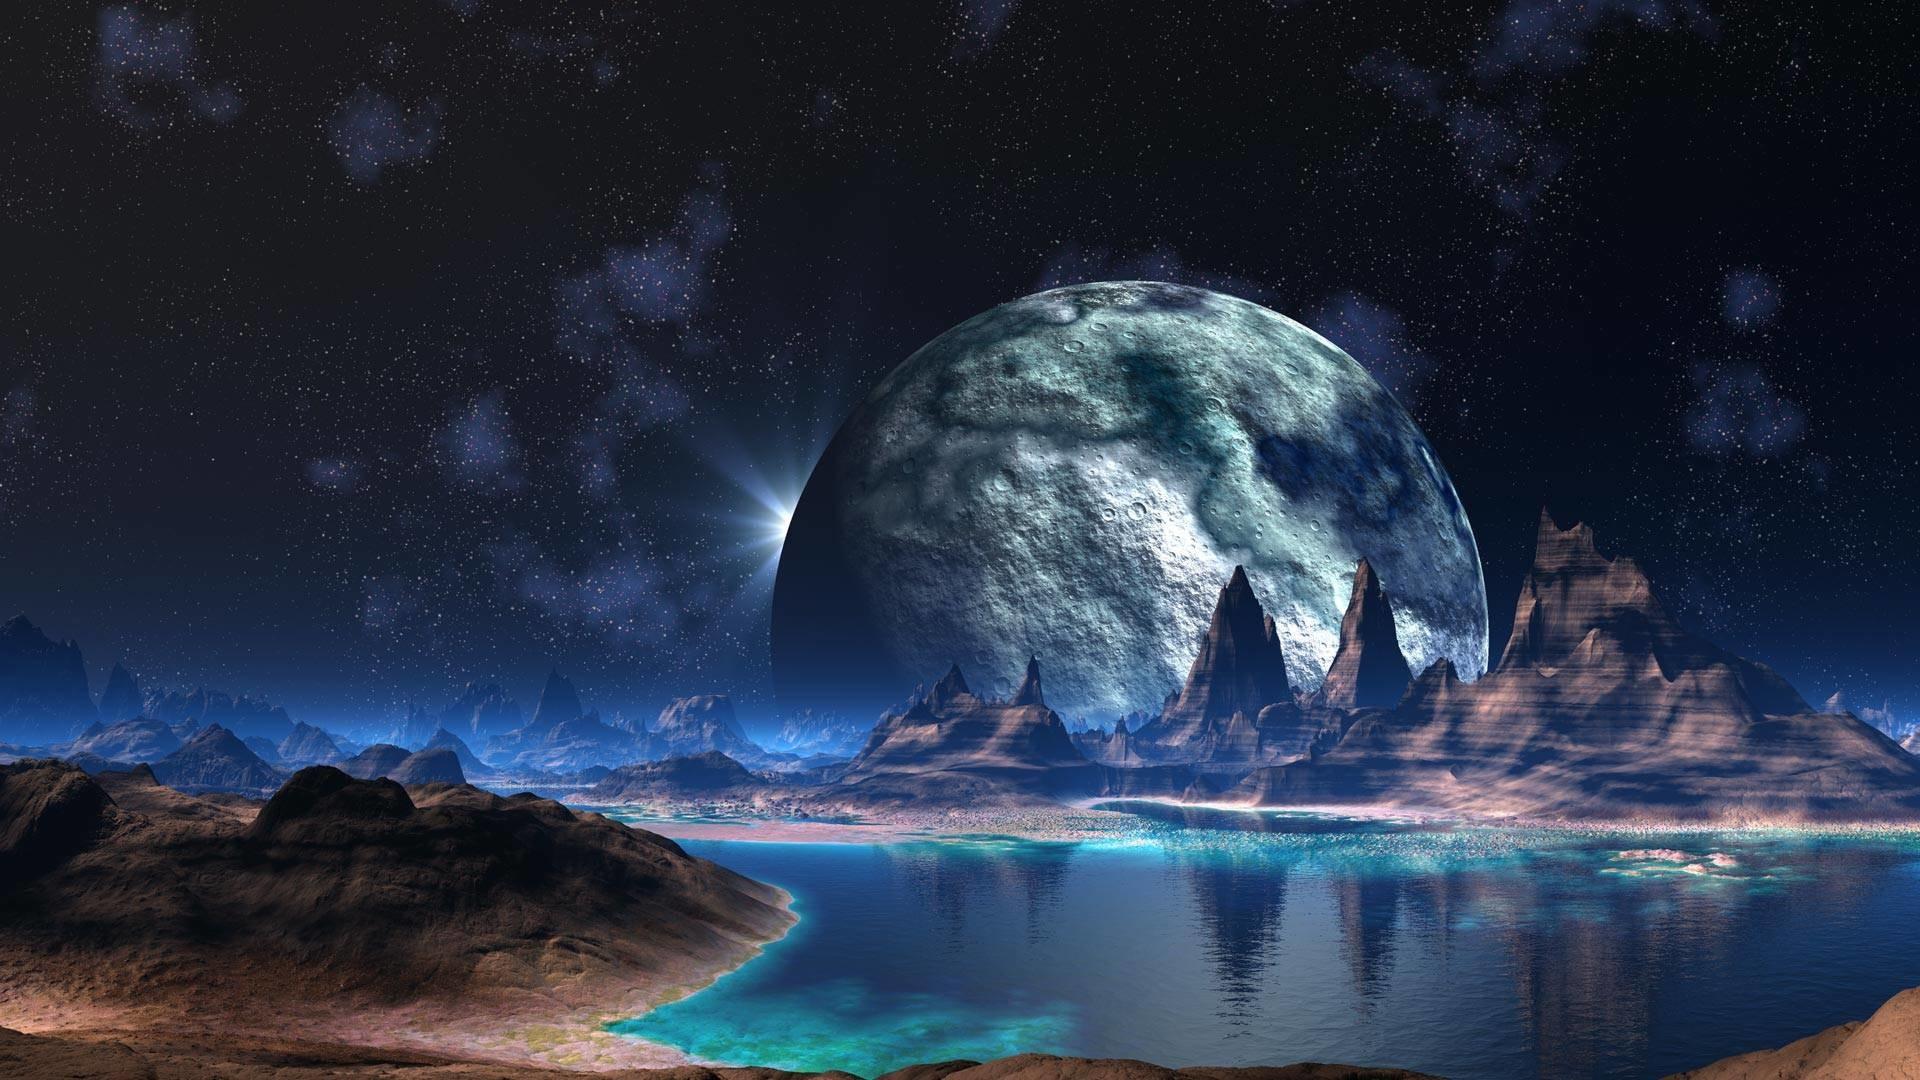 Image for Fantasy Landscape Space Wallpaper 2014 HD